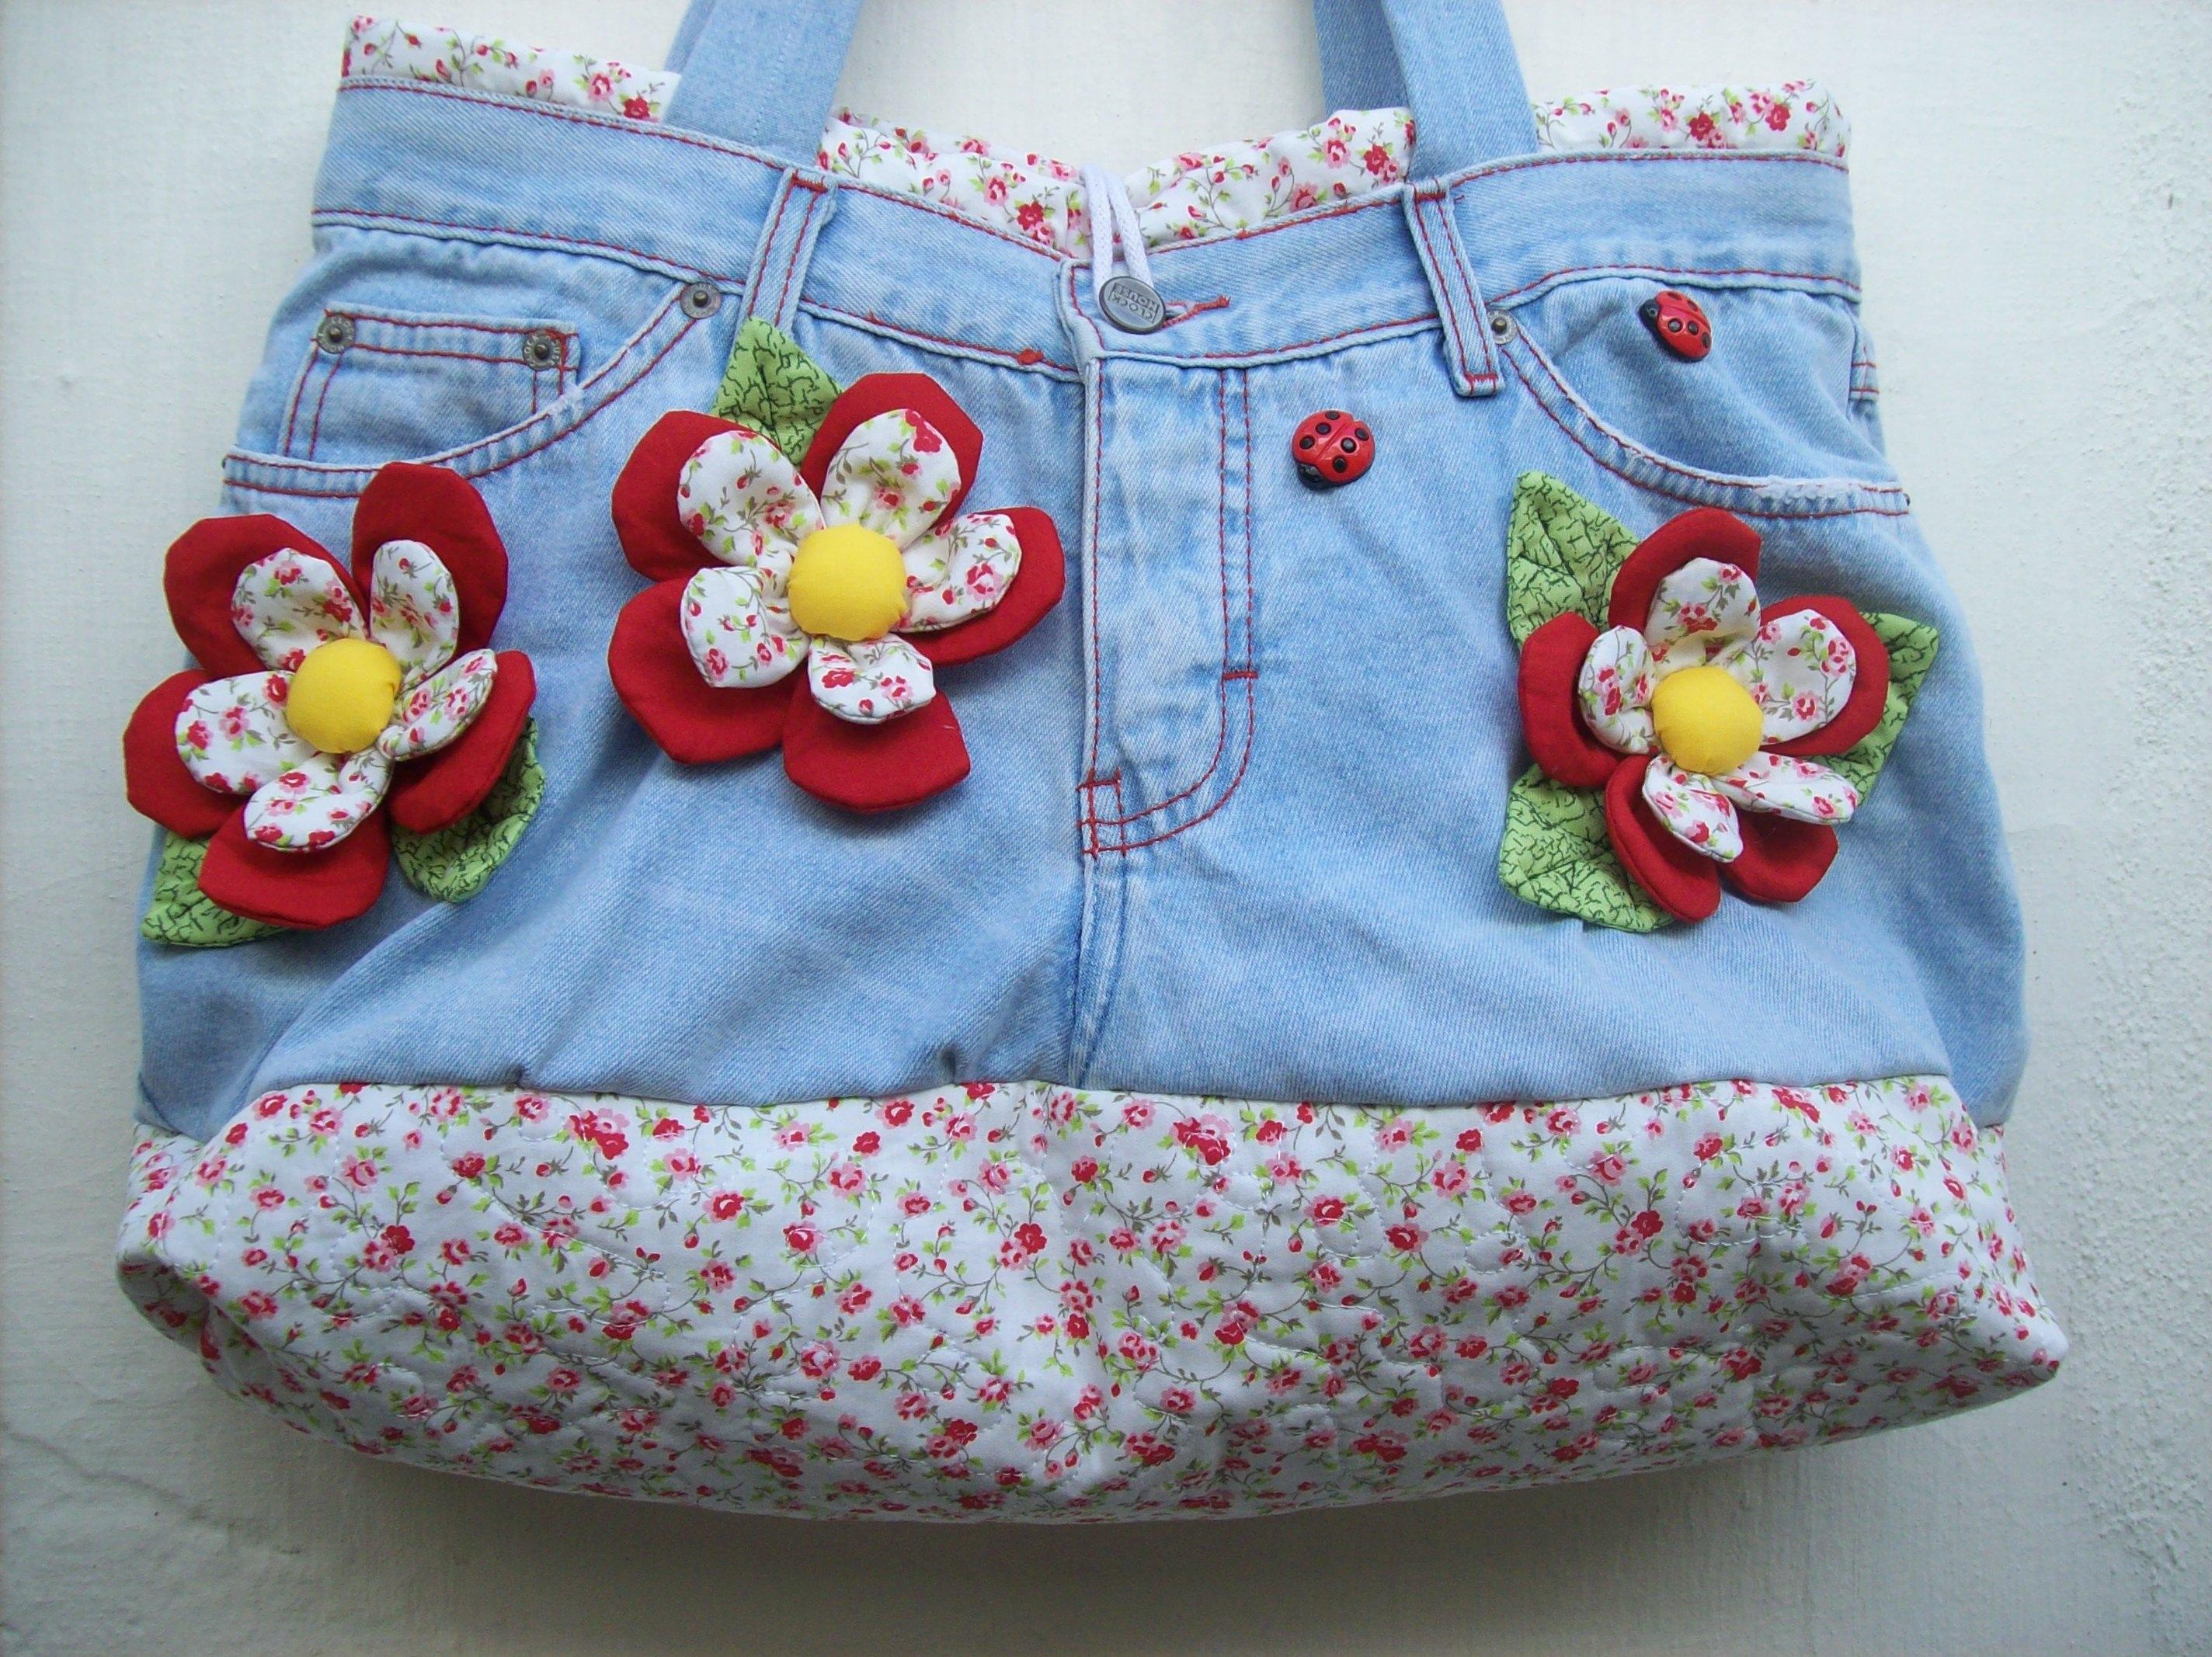 Bolsa De Tecido E Jeans : Bolsa jeans quot flowers dianne pedrosa elo